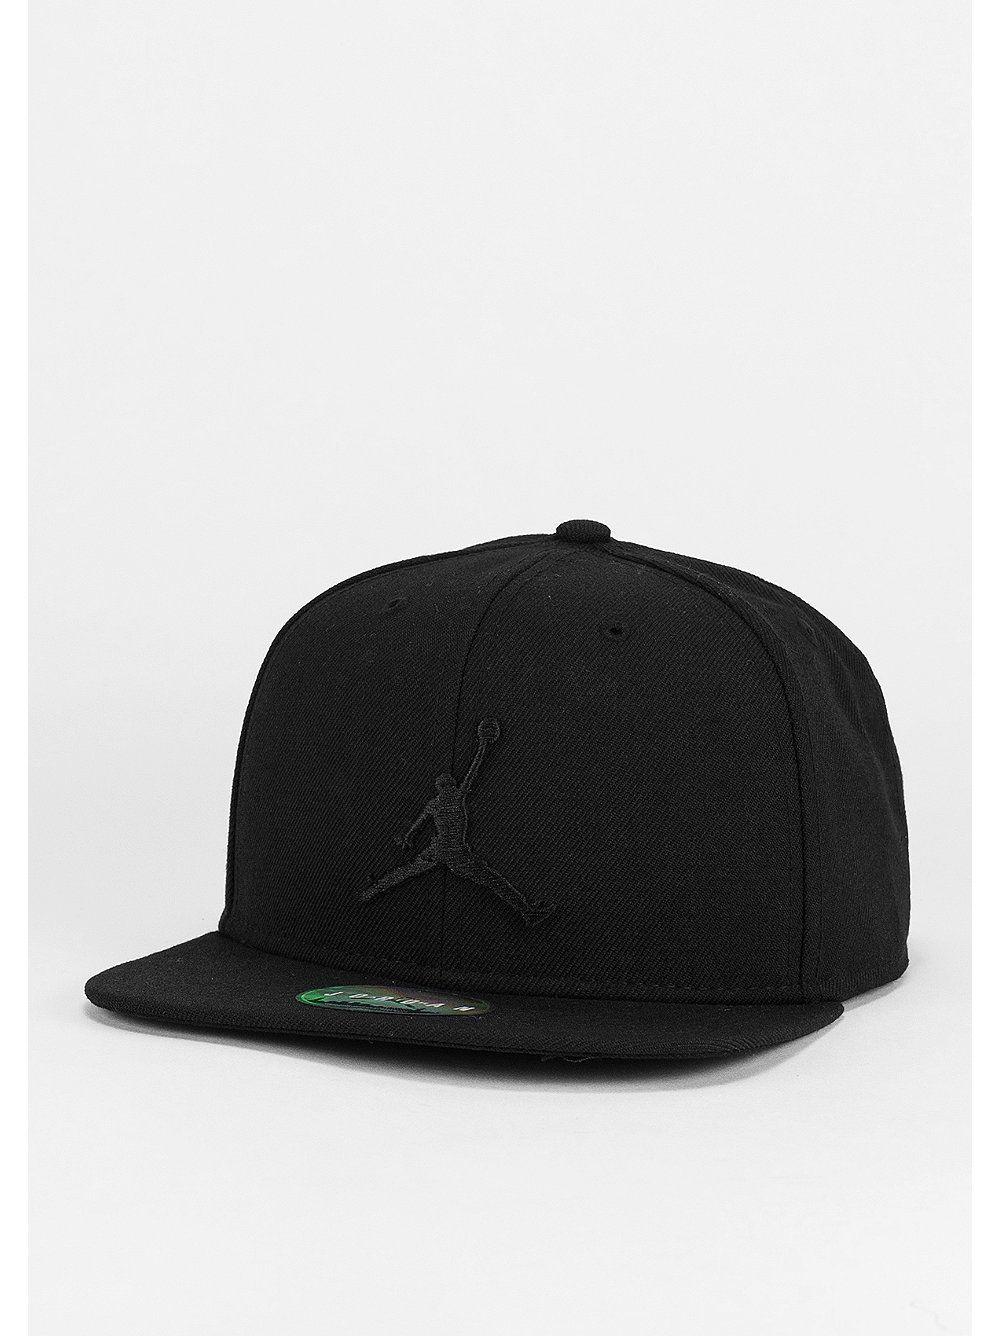 2dcee419ddf JORDAN Snapback-Cap Jumpman black black